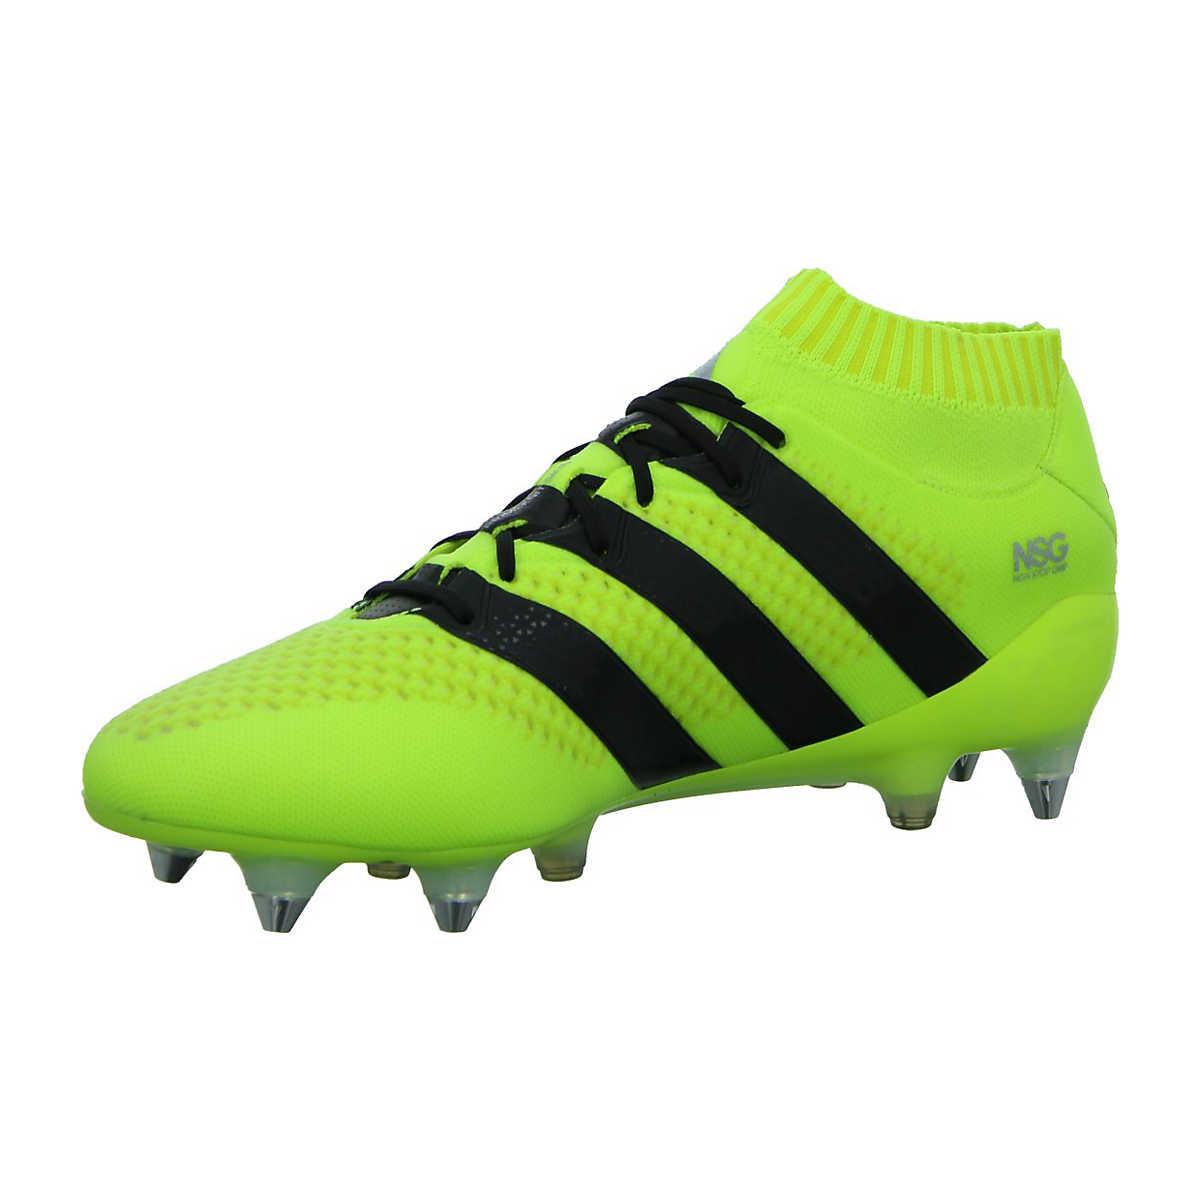 adidas Performance Sportschuhe gelb-kombi - adidas Performance - Sportschuhe - Schuhe - mirapodo.de